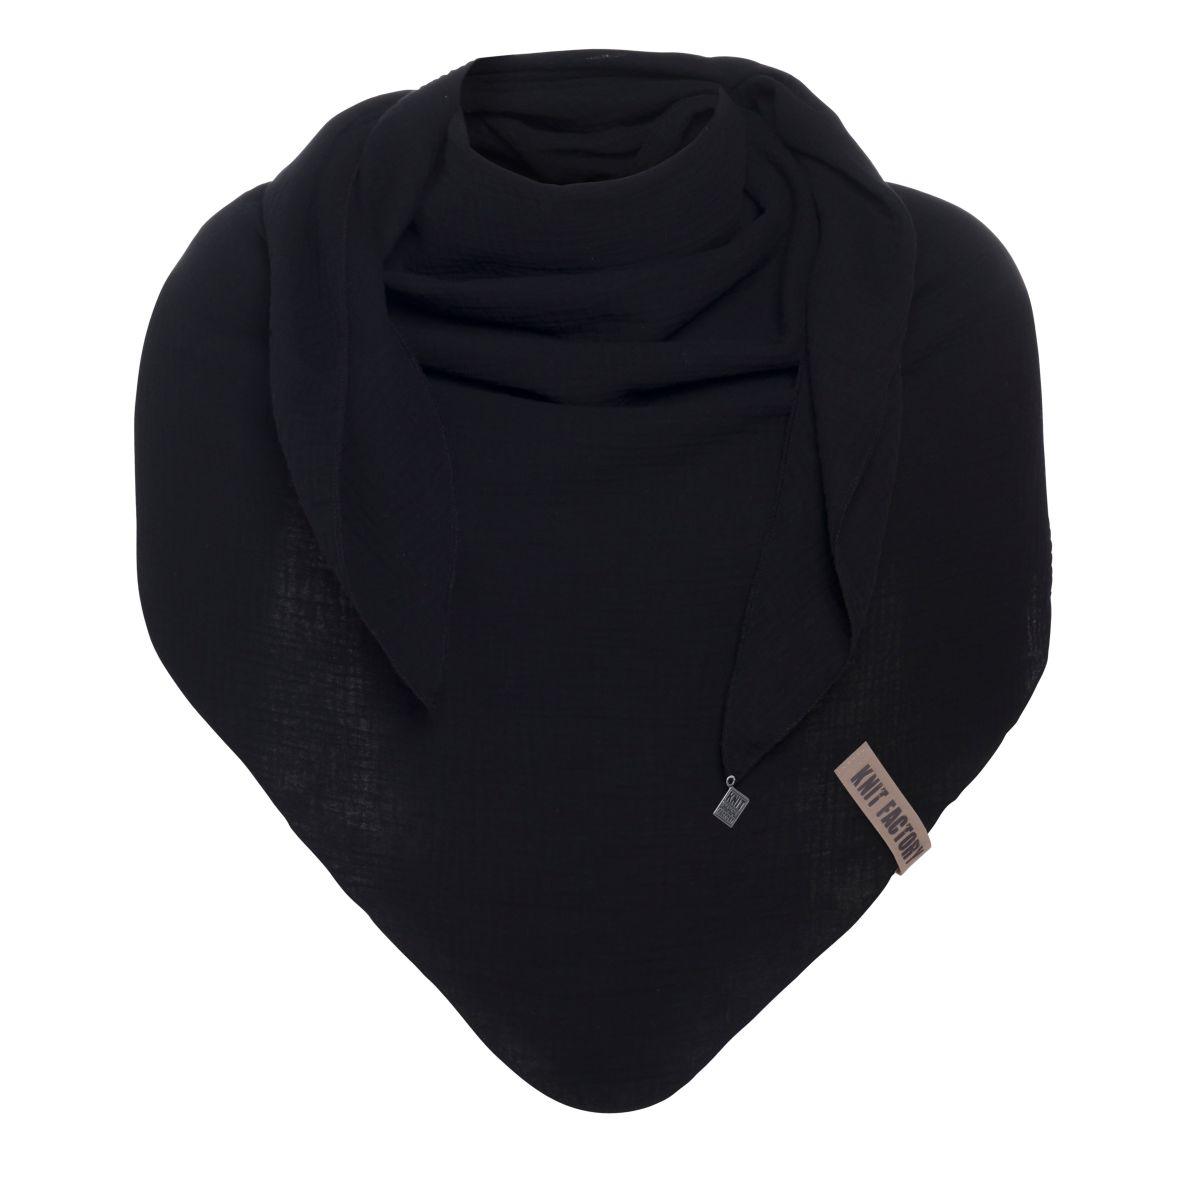 liv triangle scarf black